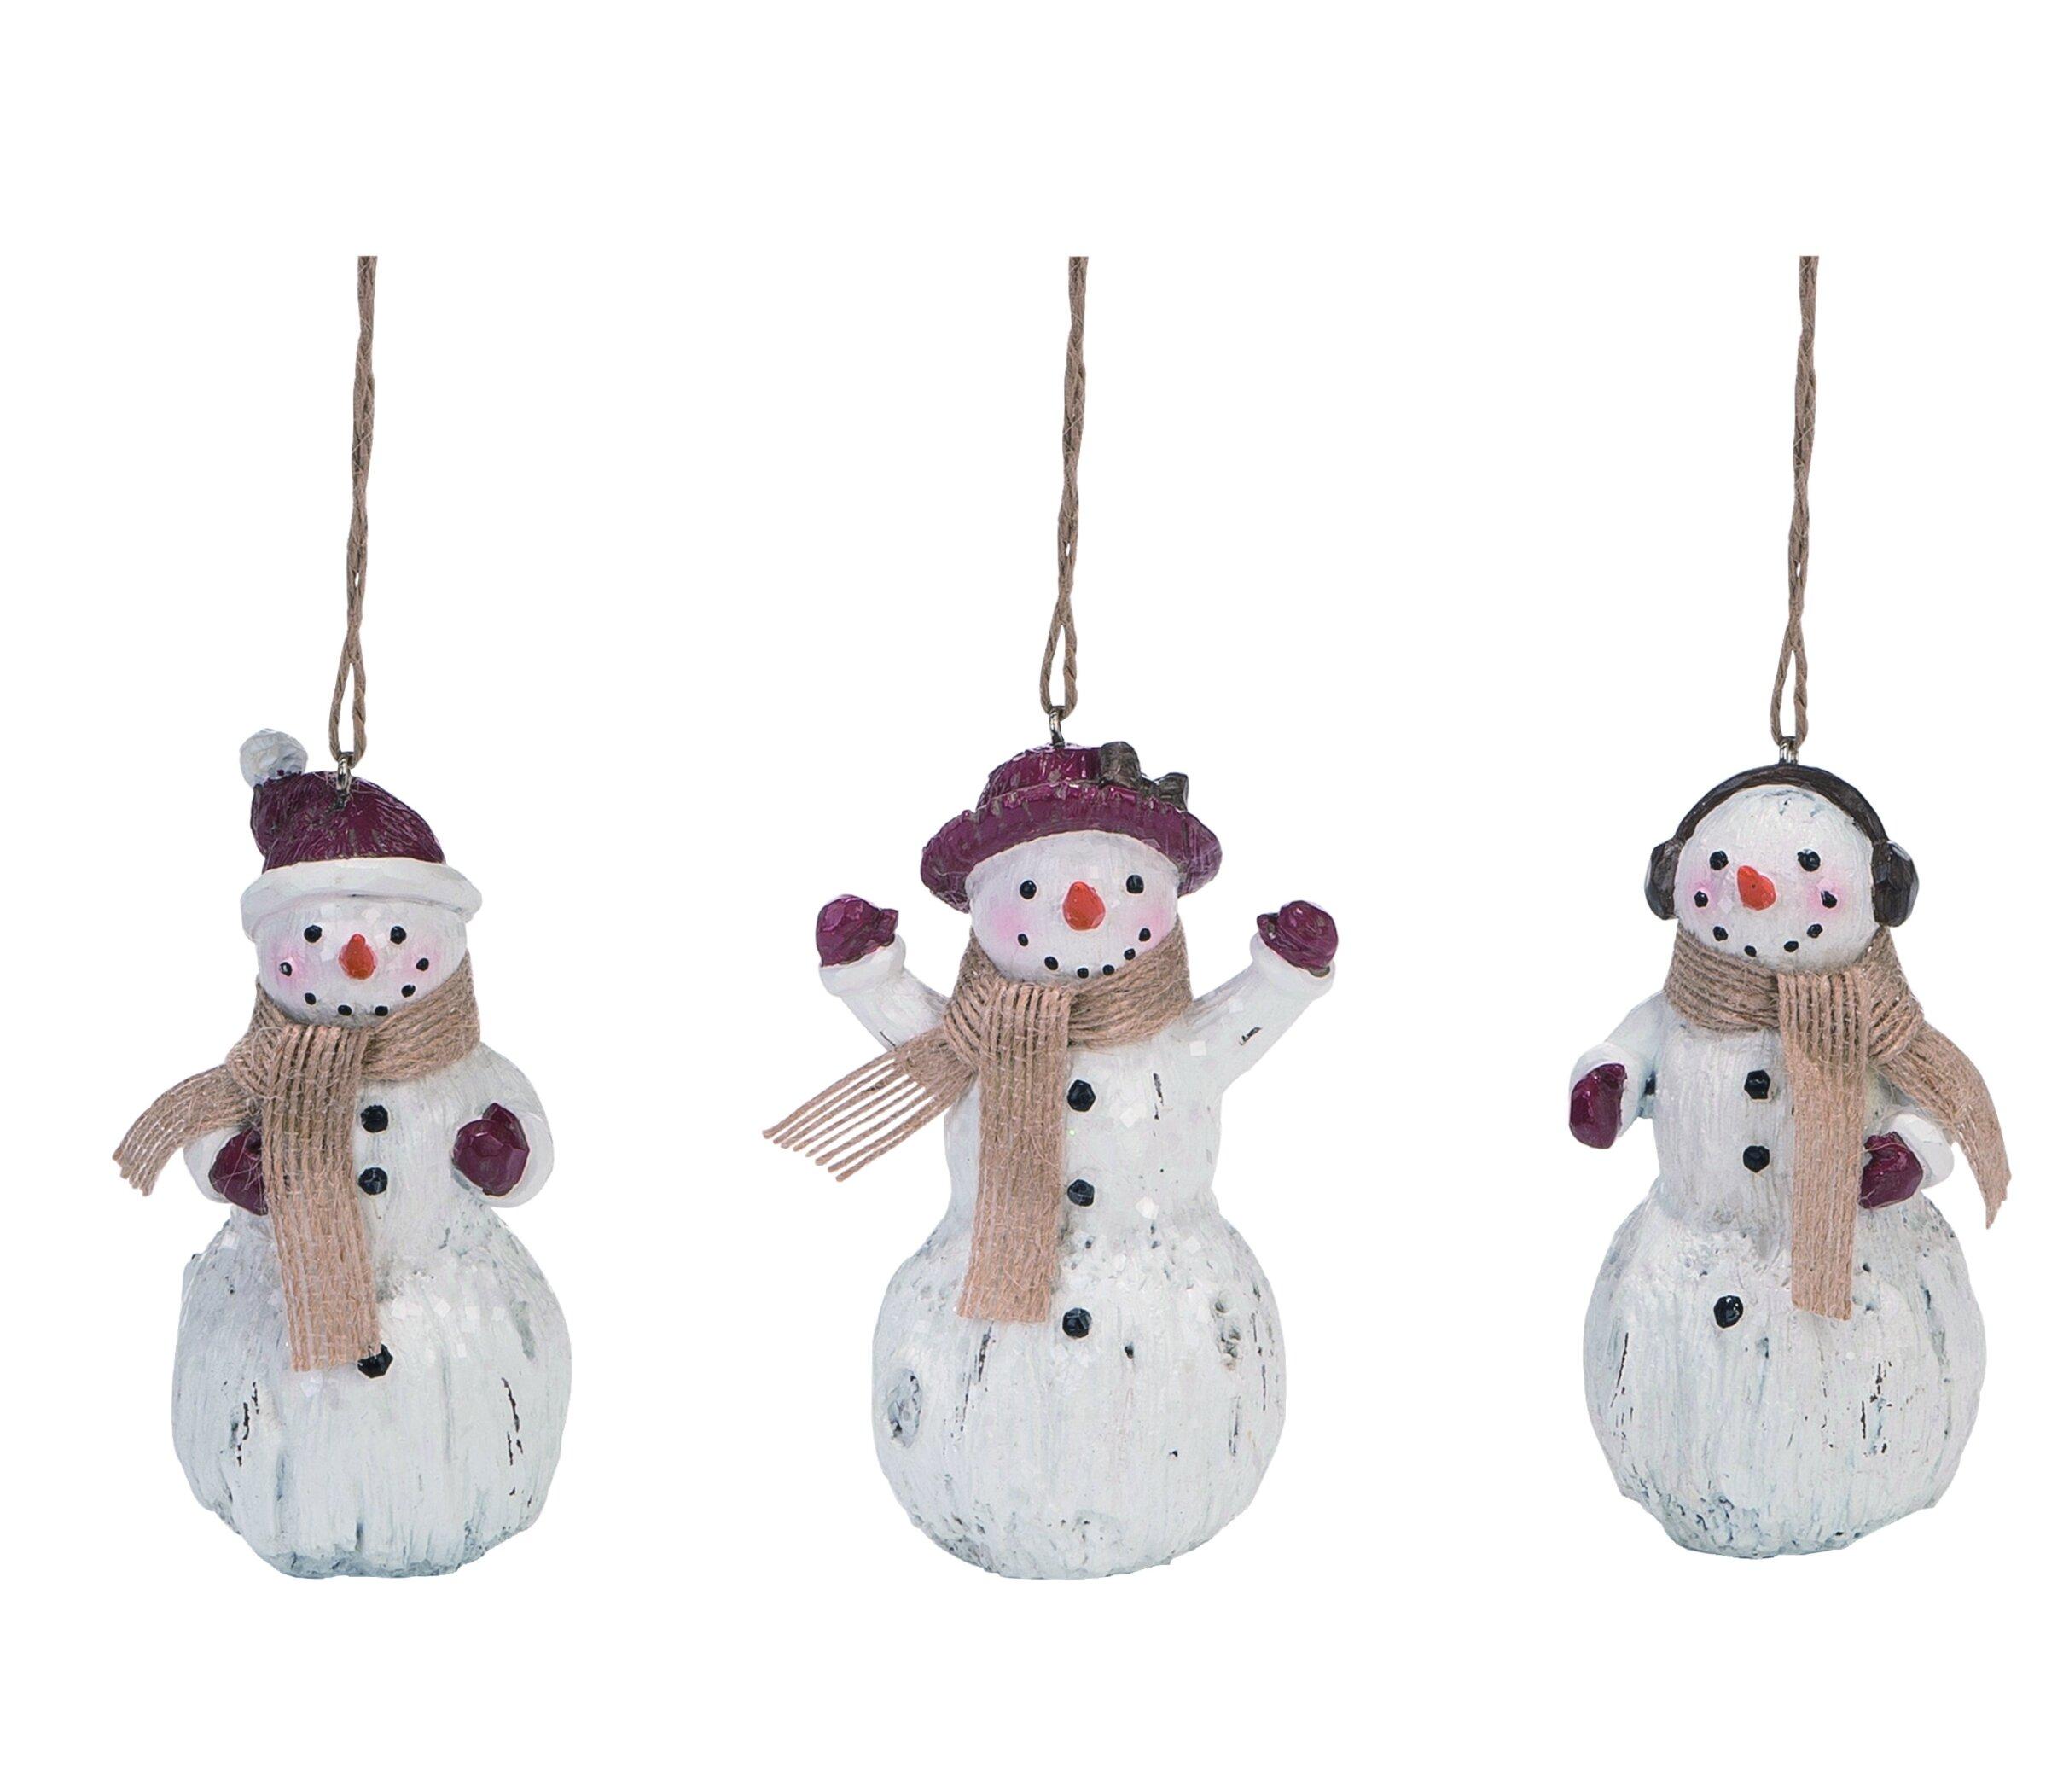 The Holiday Aisle 3 Piece Snowman Hanging Figurine Ornament Set Wayfair